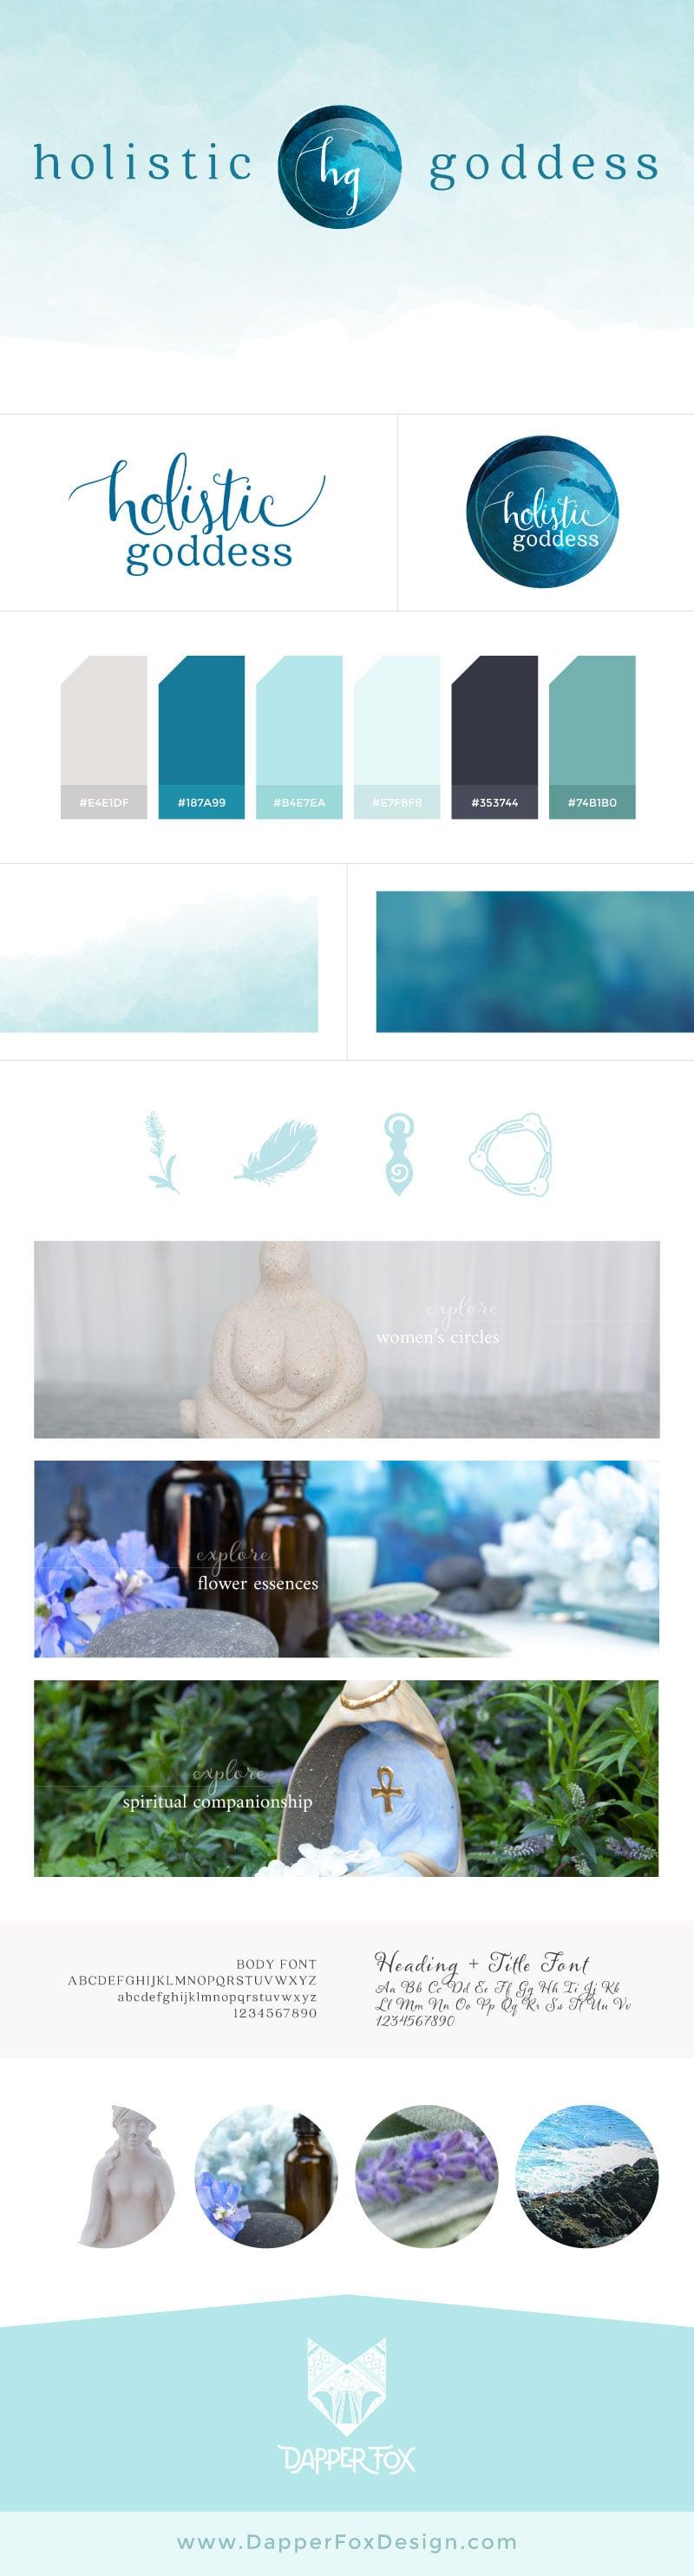 Holistic Goddess Brand Board and Logo Design by Dapper Fox Design - Ocean Logo, blue, modern logo design